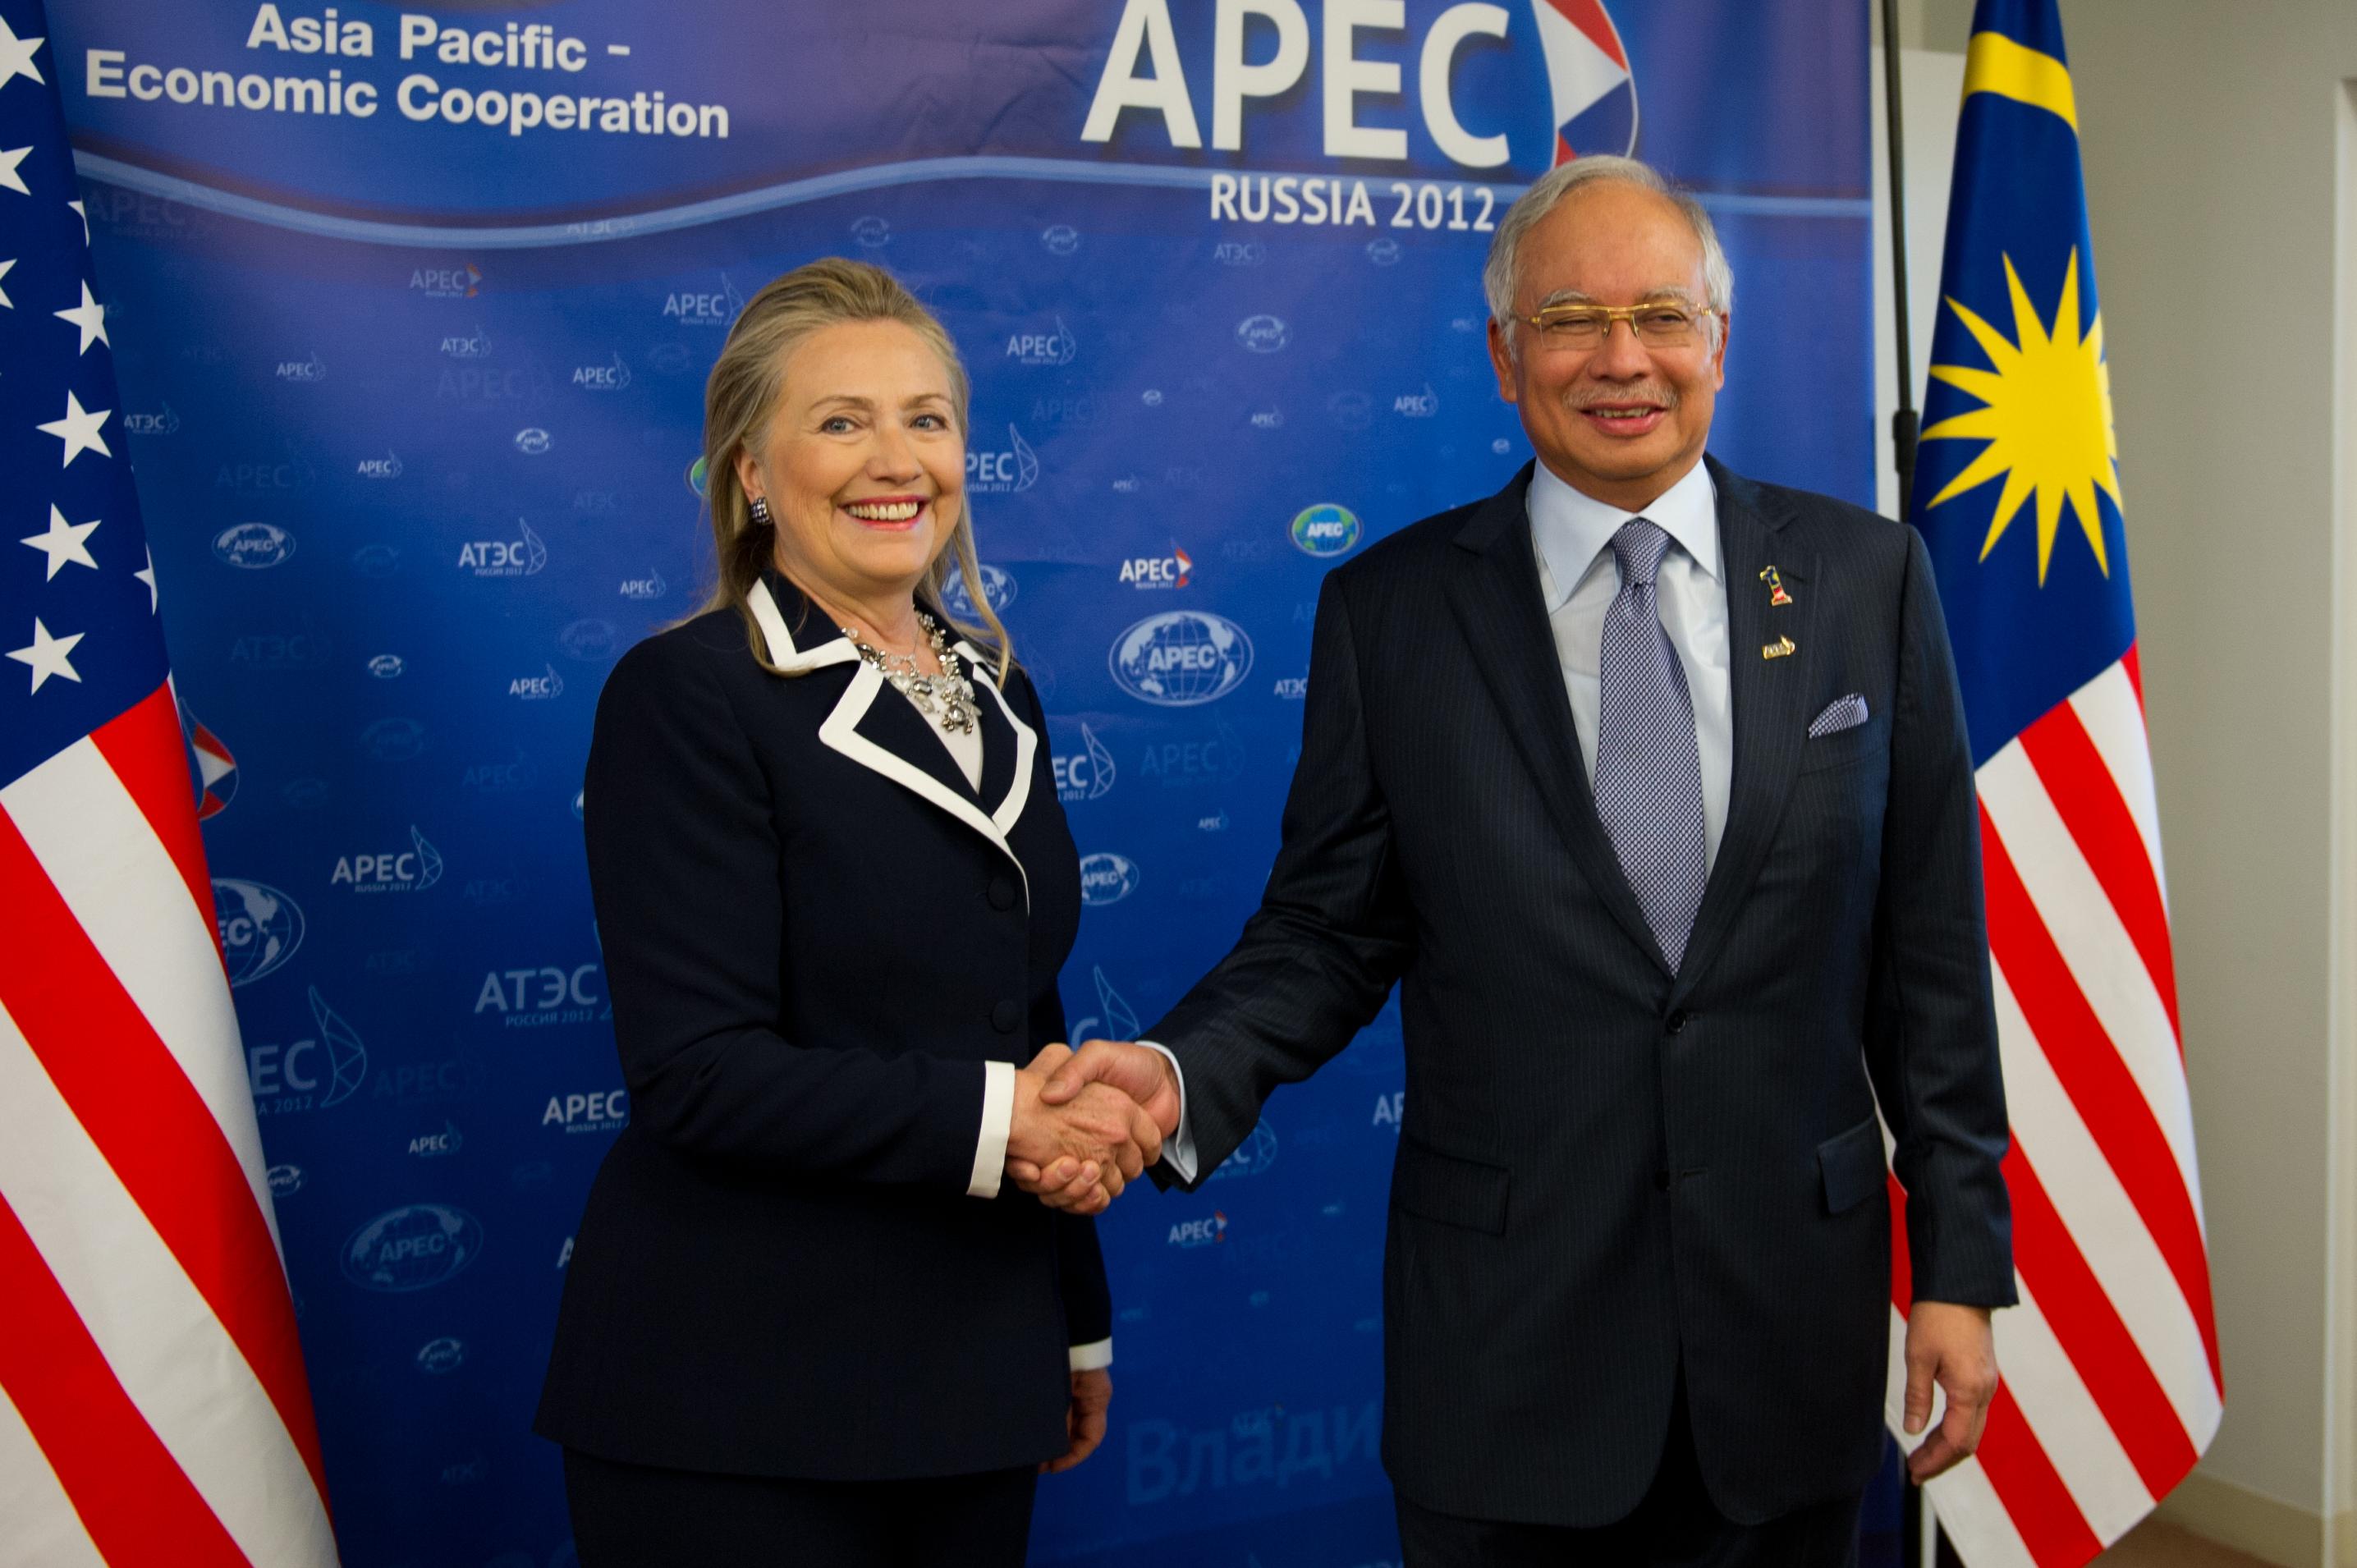 burma and economic cooperation